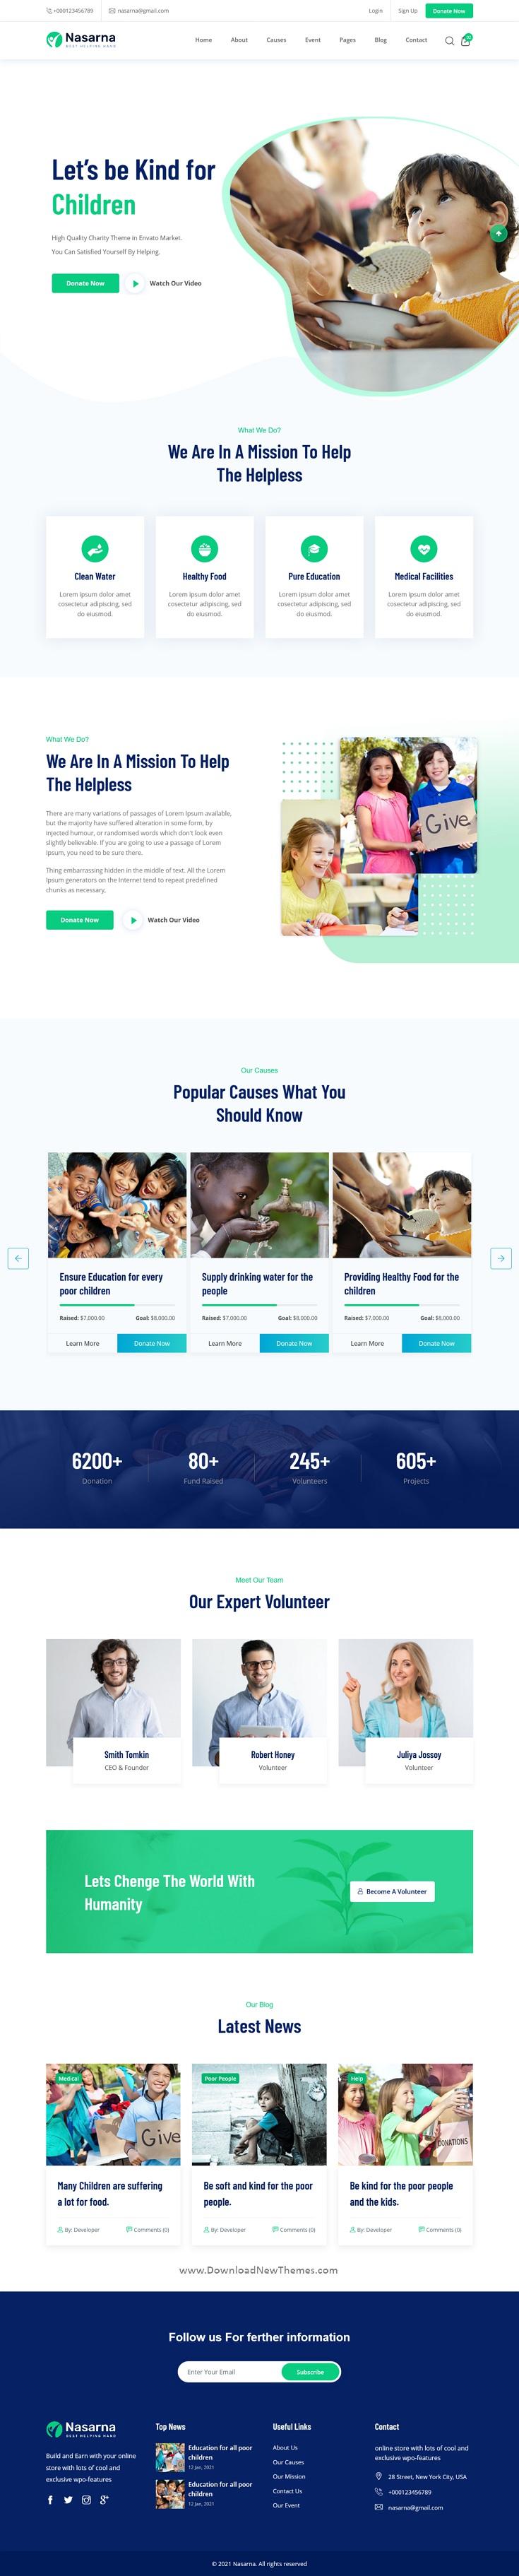 Charity Nonprofit Next JS Template